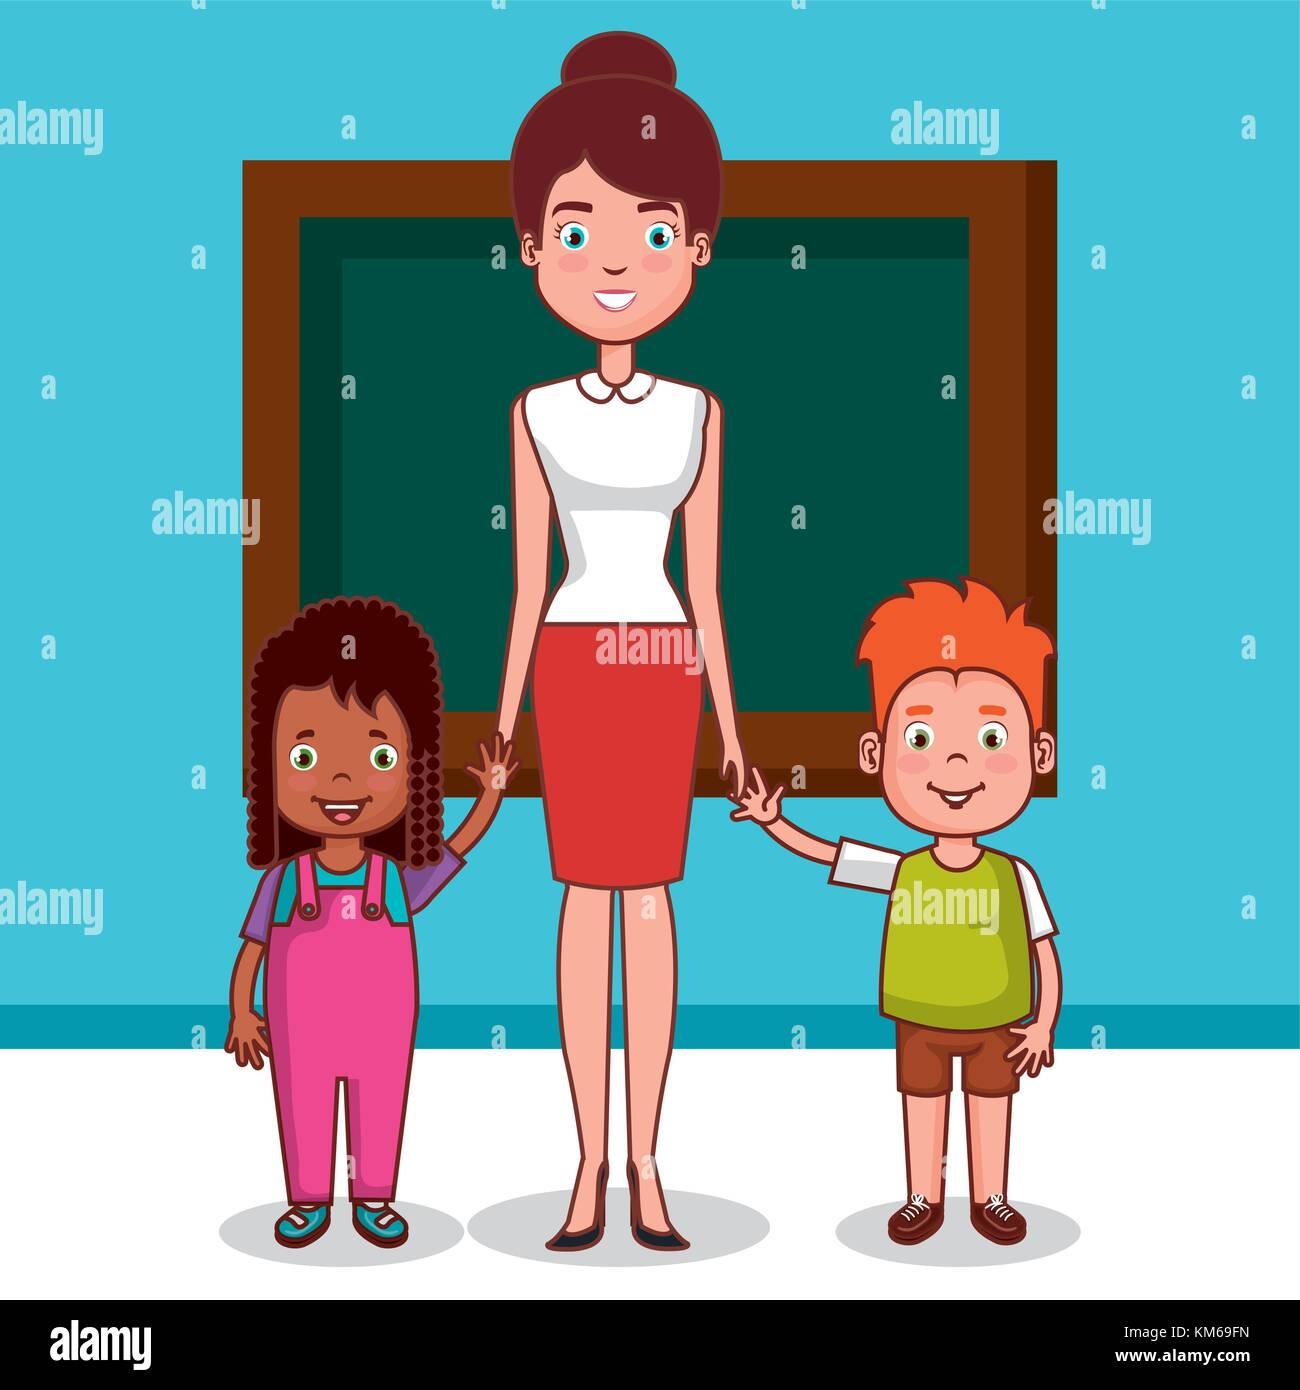 Clipart illustration preschool classroom stockfotos for Innenraumdesign studieren